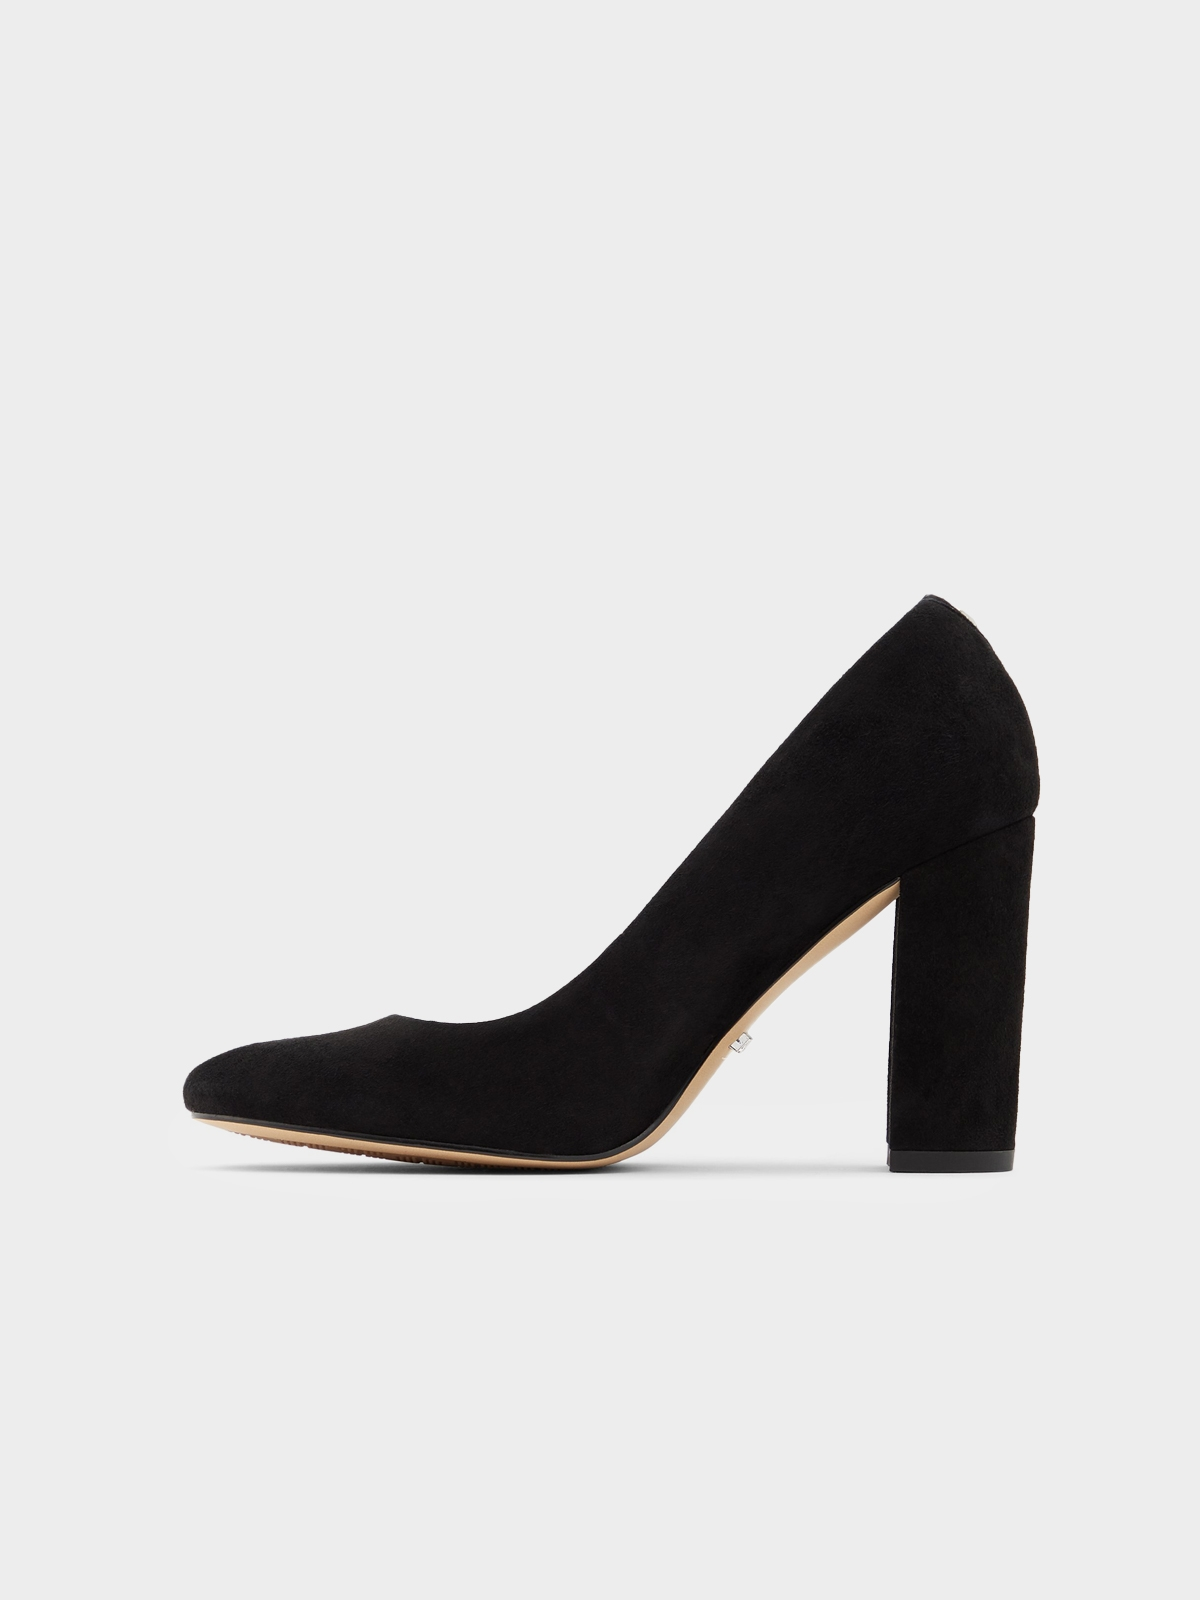 Aldo Aurelline Pump Heels Black